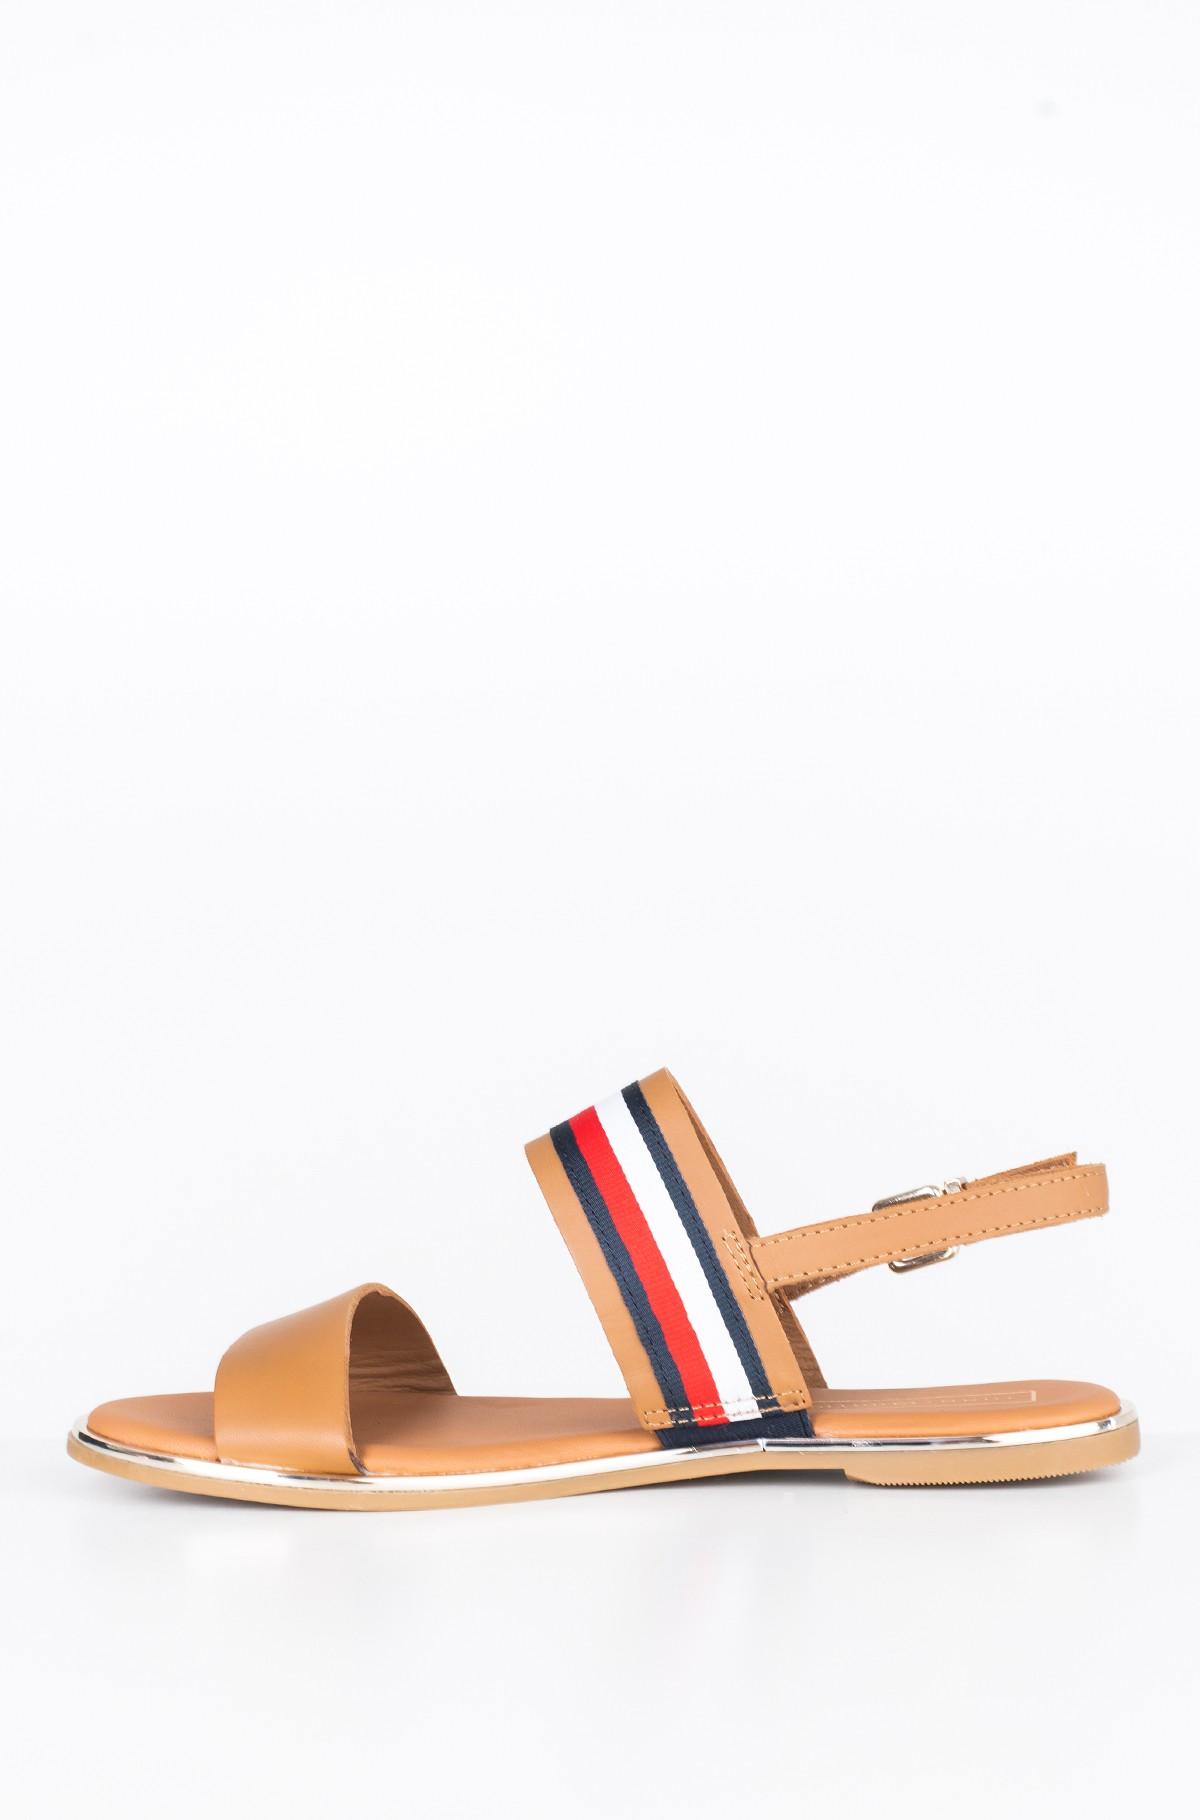 Sandals FLAT SANDAL CORPORATE RIBBON-full-2